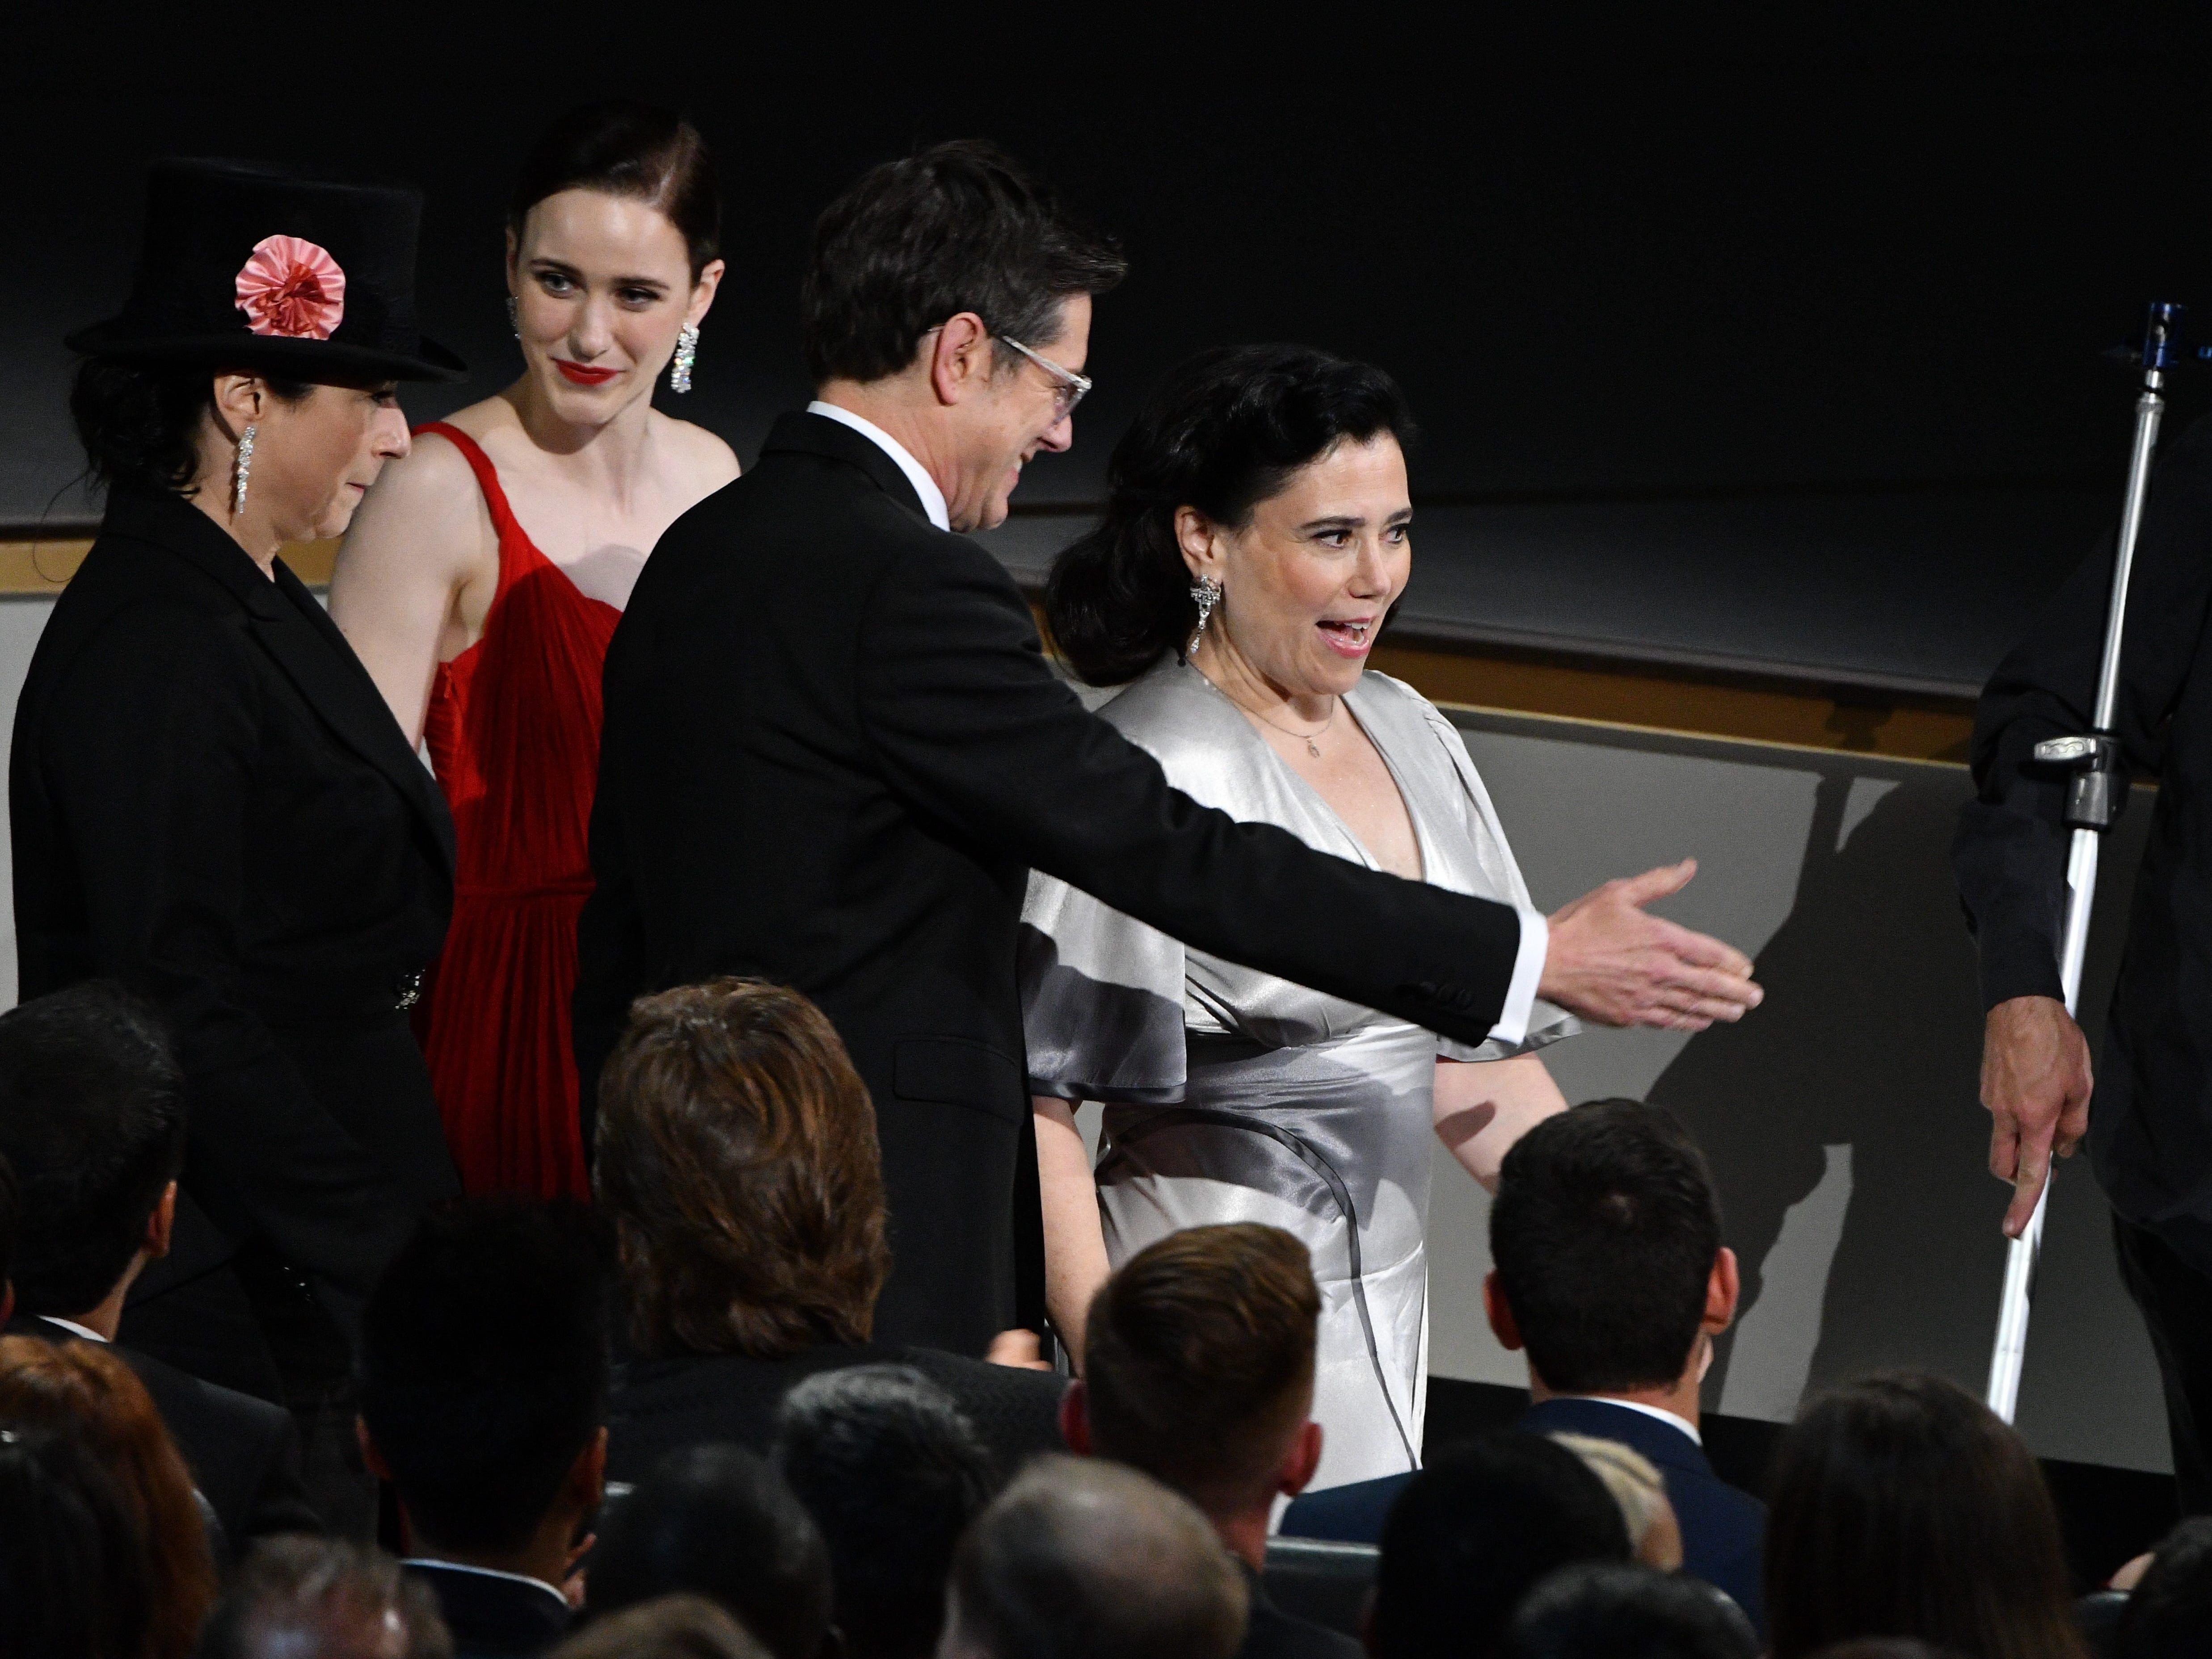 Amy Sherman-Palladino, Rachel Brosnahan, Daniel Palladino and Alex Borstein walk towards the stage to accept the award for outstanding comedy series.